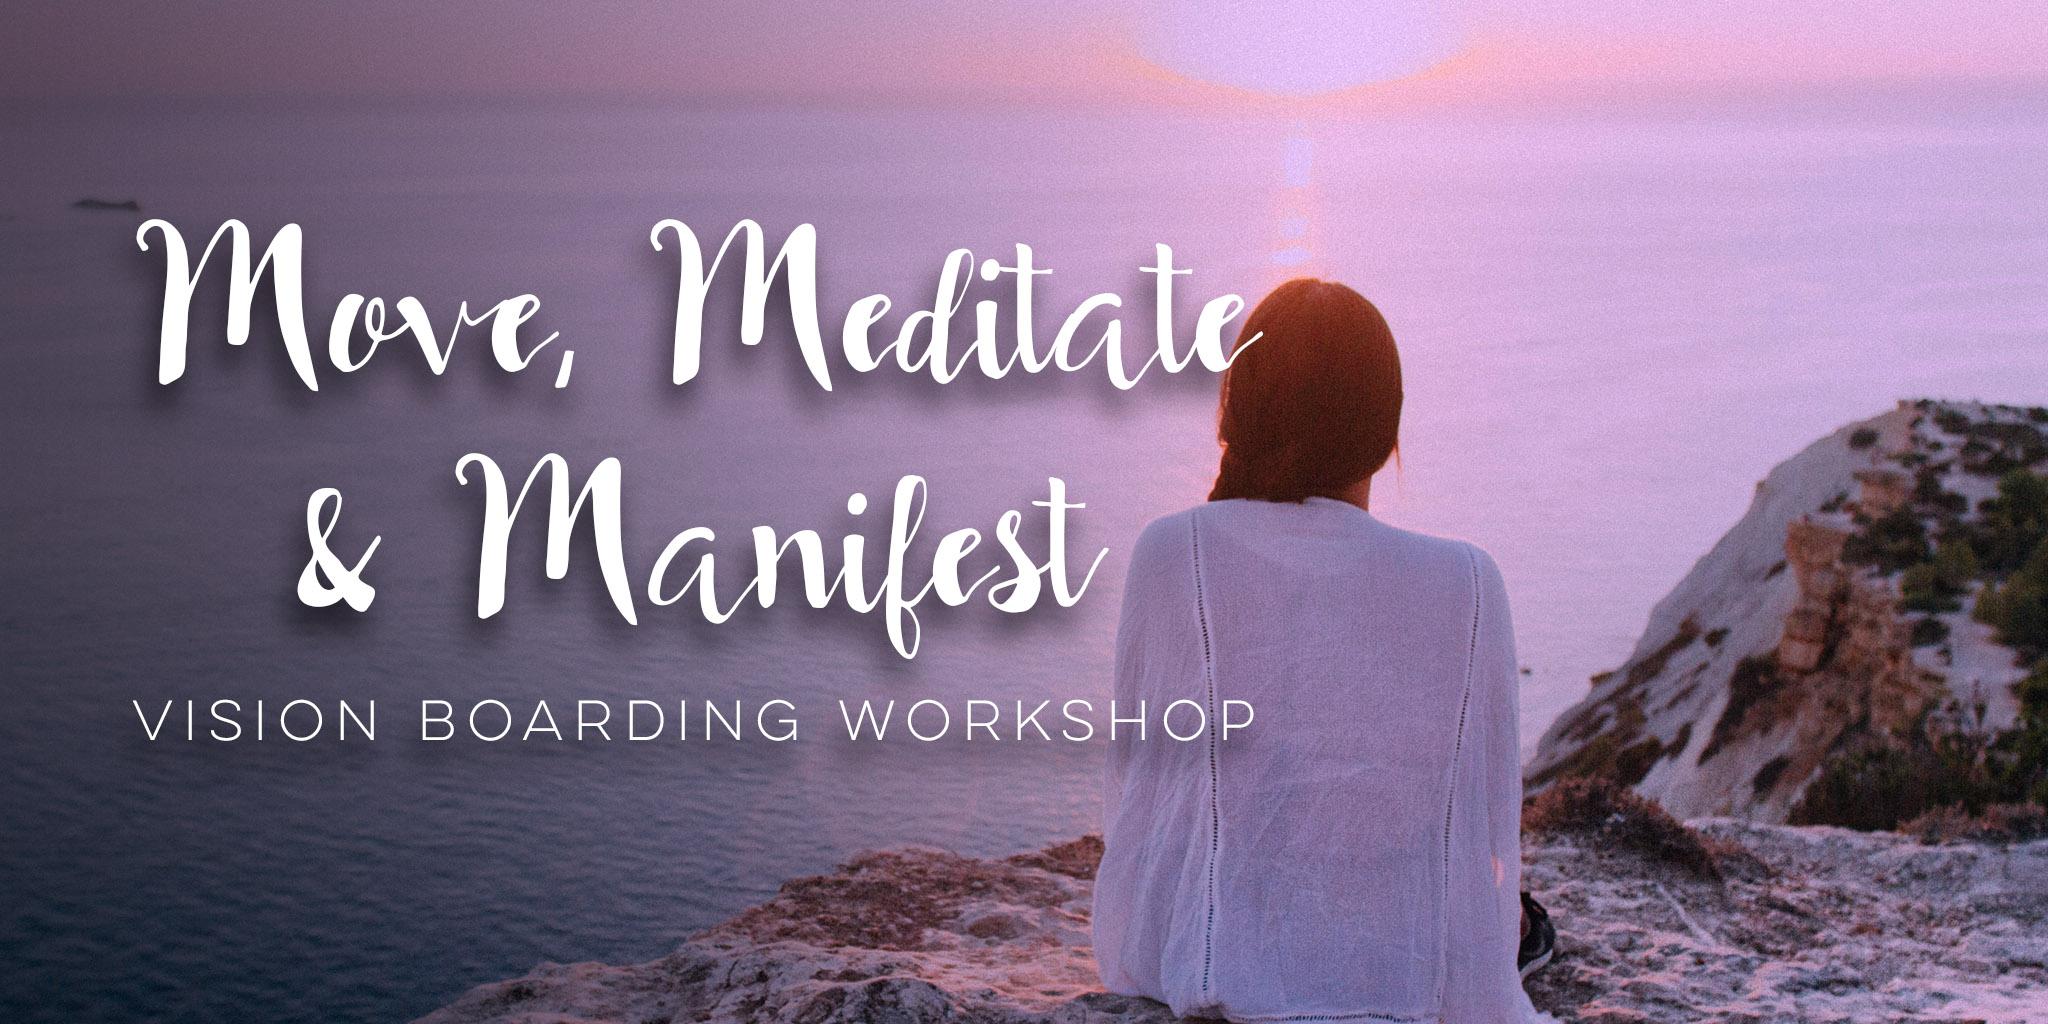 move-mediatate-manifest.jpg